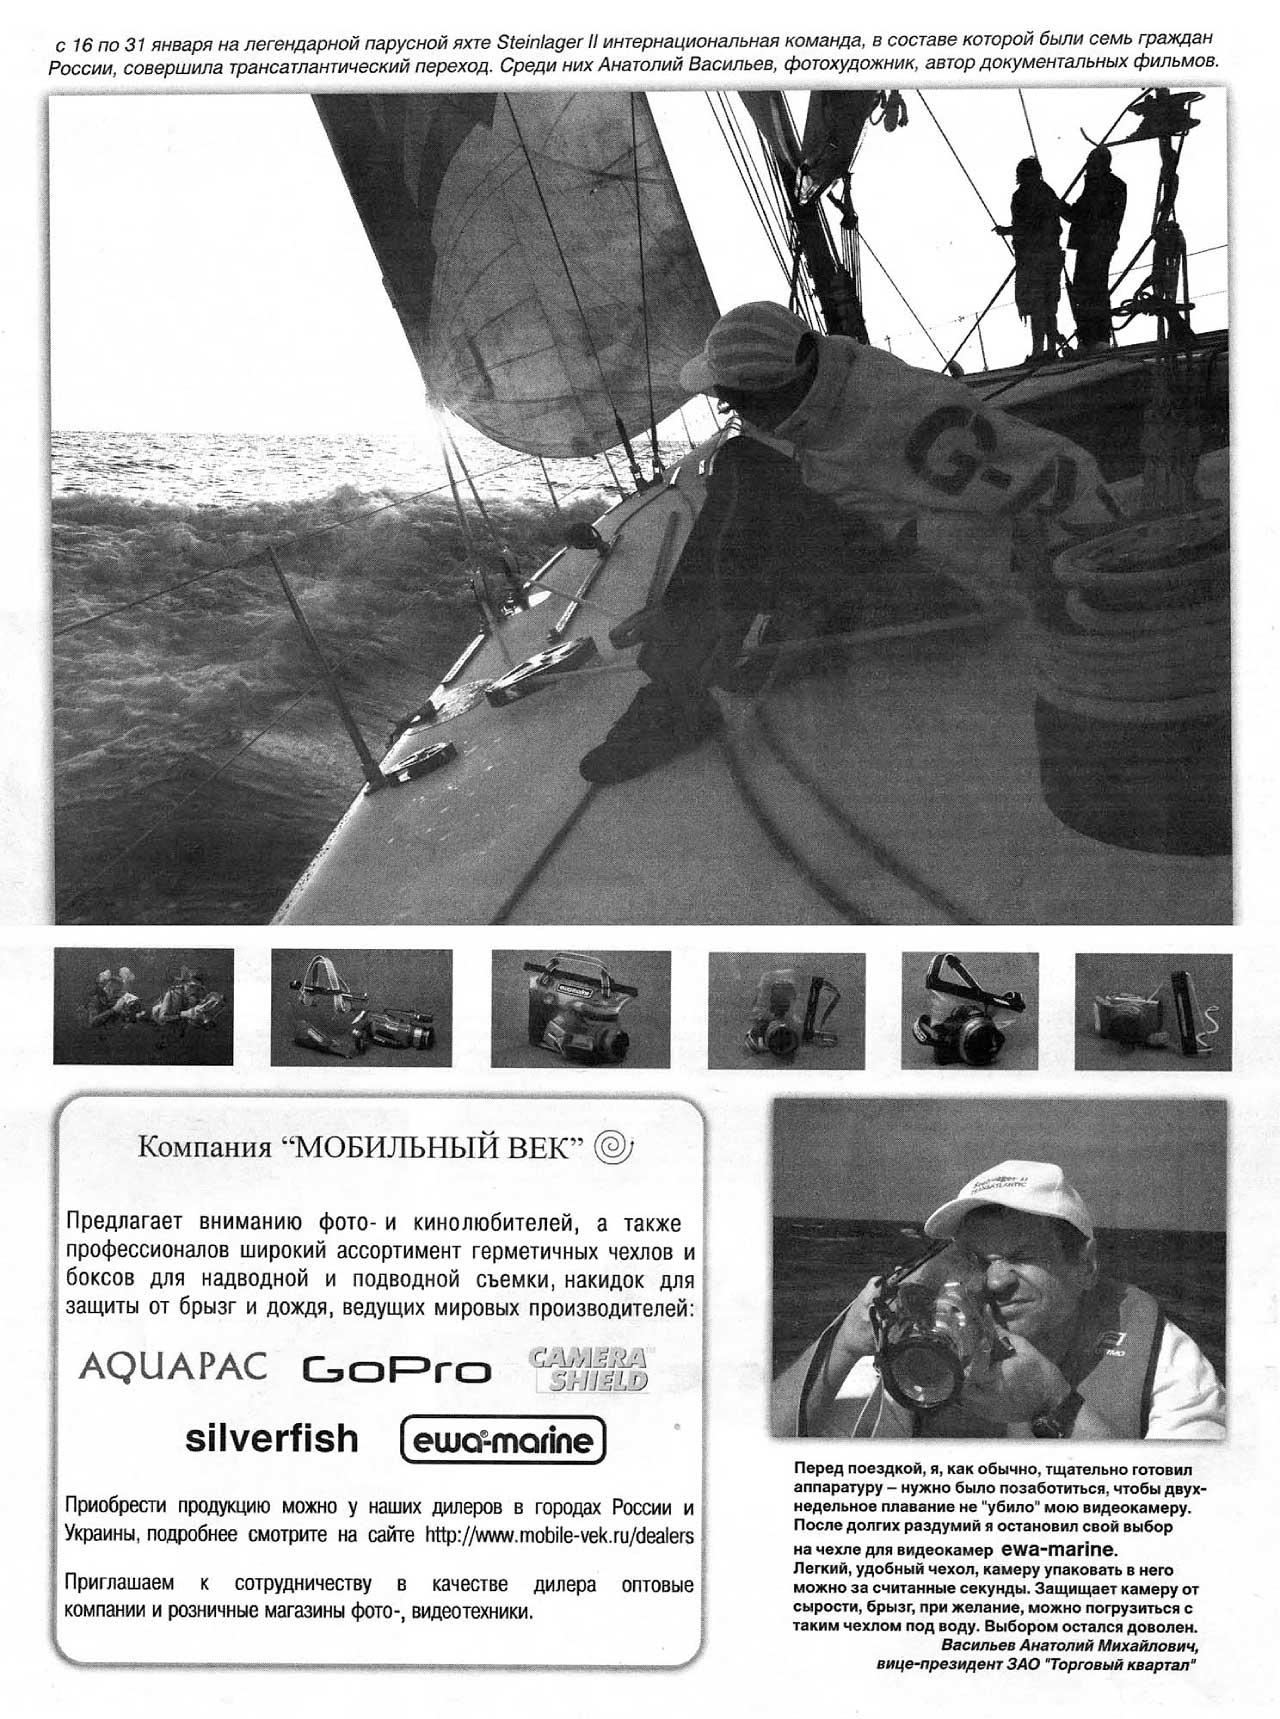 Легендарная парусная яхта Steinlager II и чехол для видеокамер Ewa-Marine